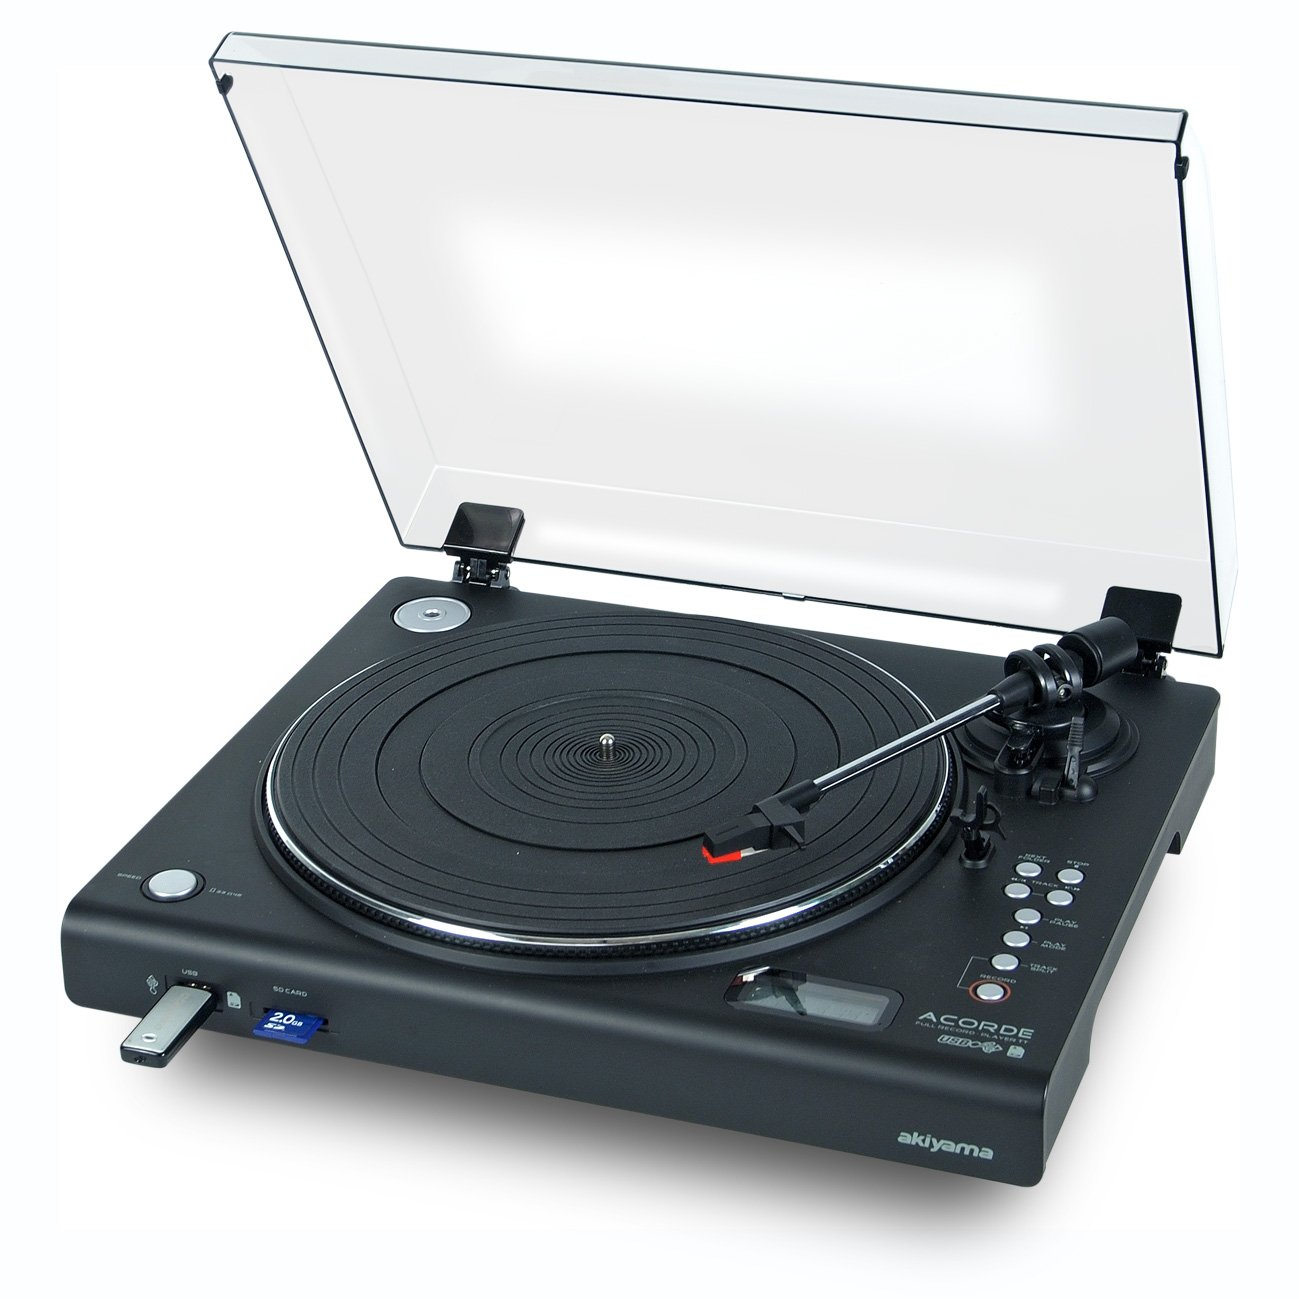 Akiyama Acorde - Giradiscos automático (con reproducción y grabación a USB/SD)